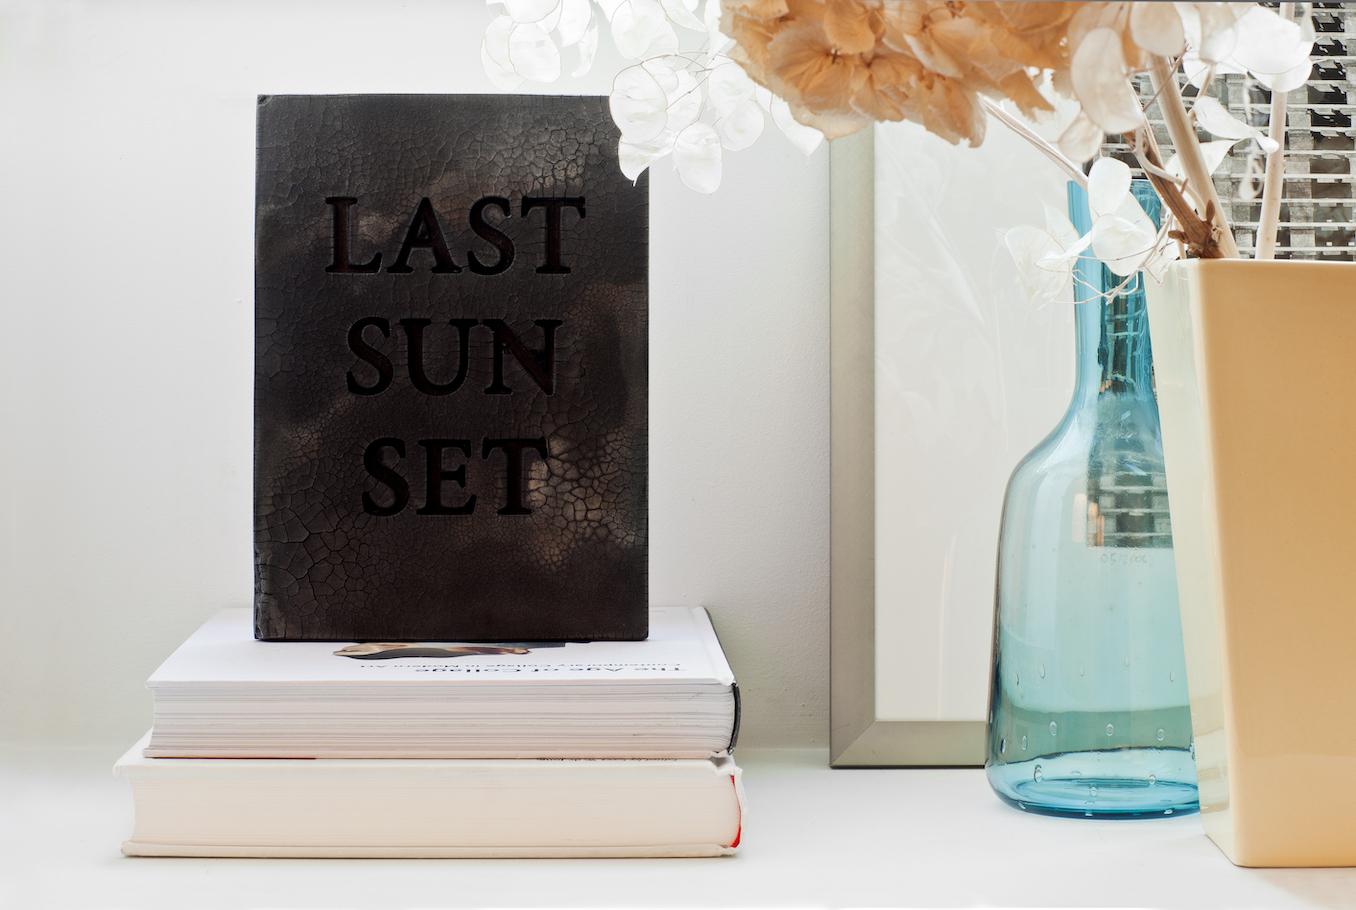 © Sandrine Pelletier, Last Sunset, Edition MBAL 2019. Photo: Lionel Henriod